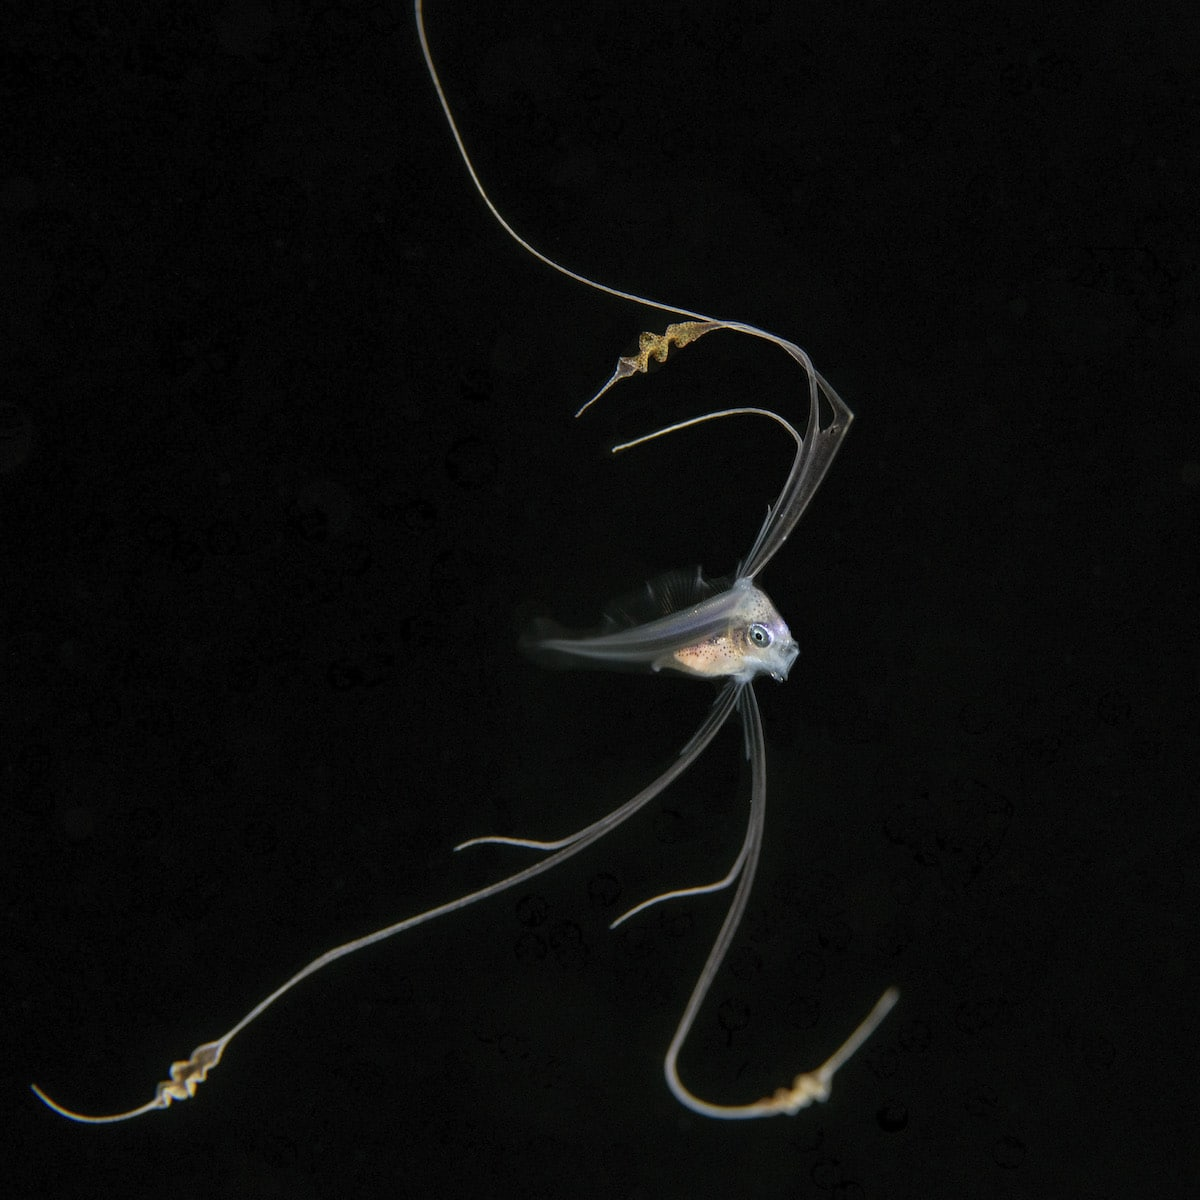 Underwater Sea Creatures by Jeff Milisen